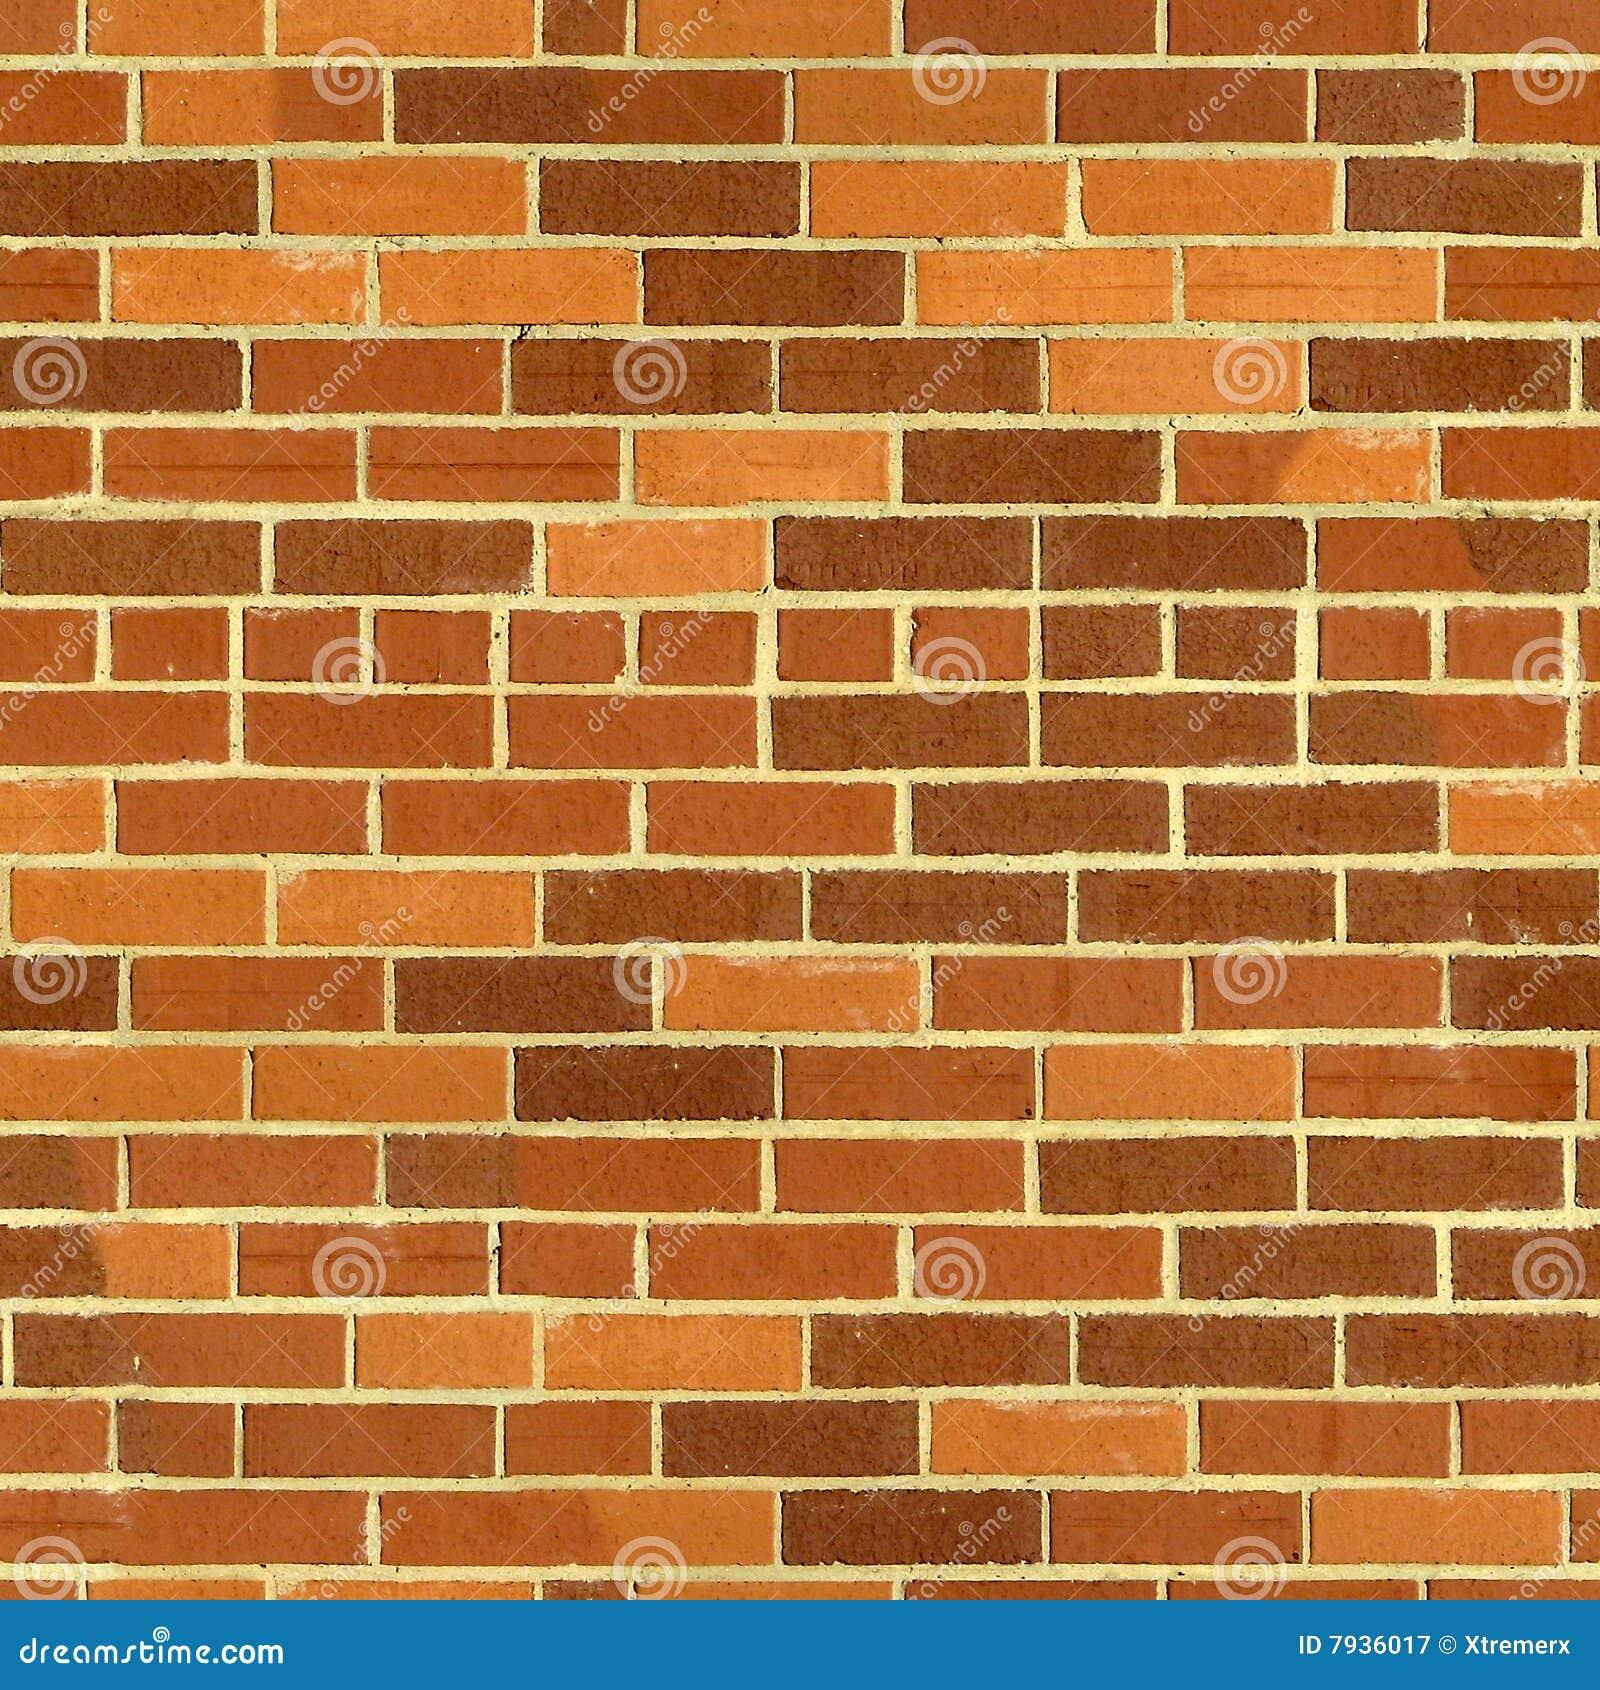 Brick wall seamless pattern royalty free stock - Brick wall patterns designs ...